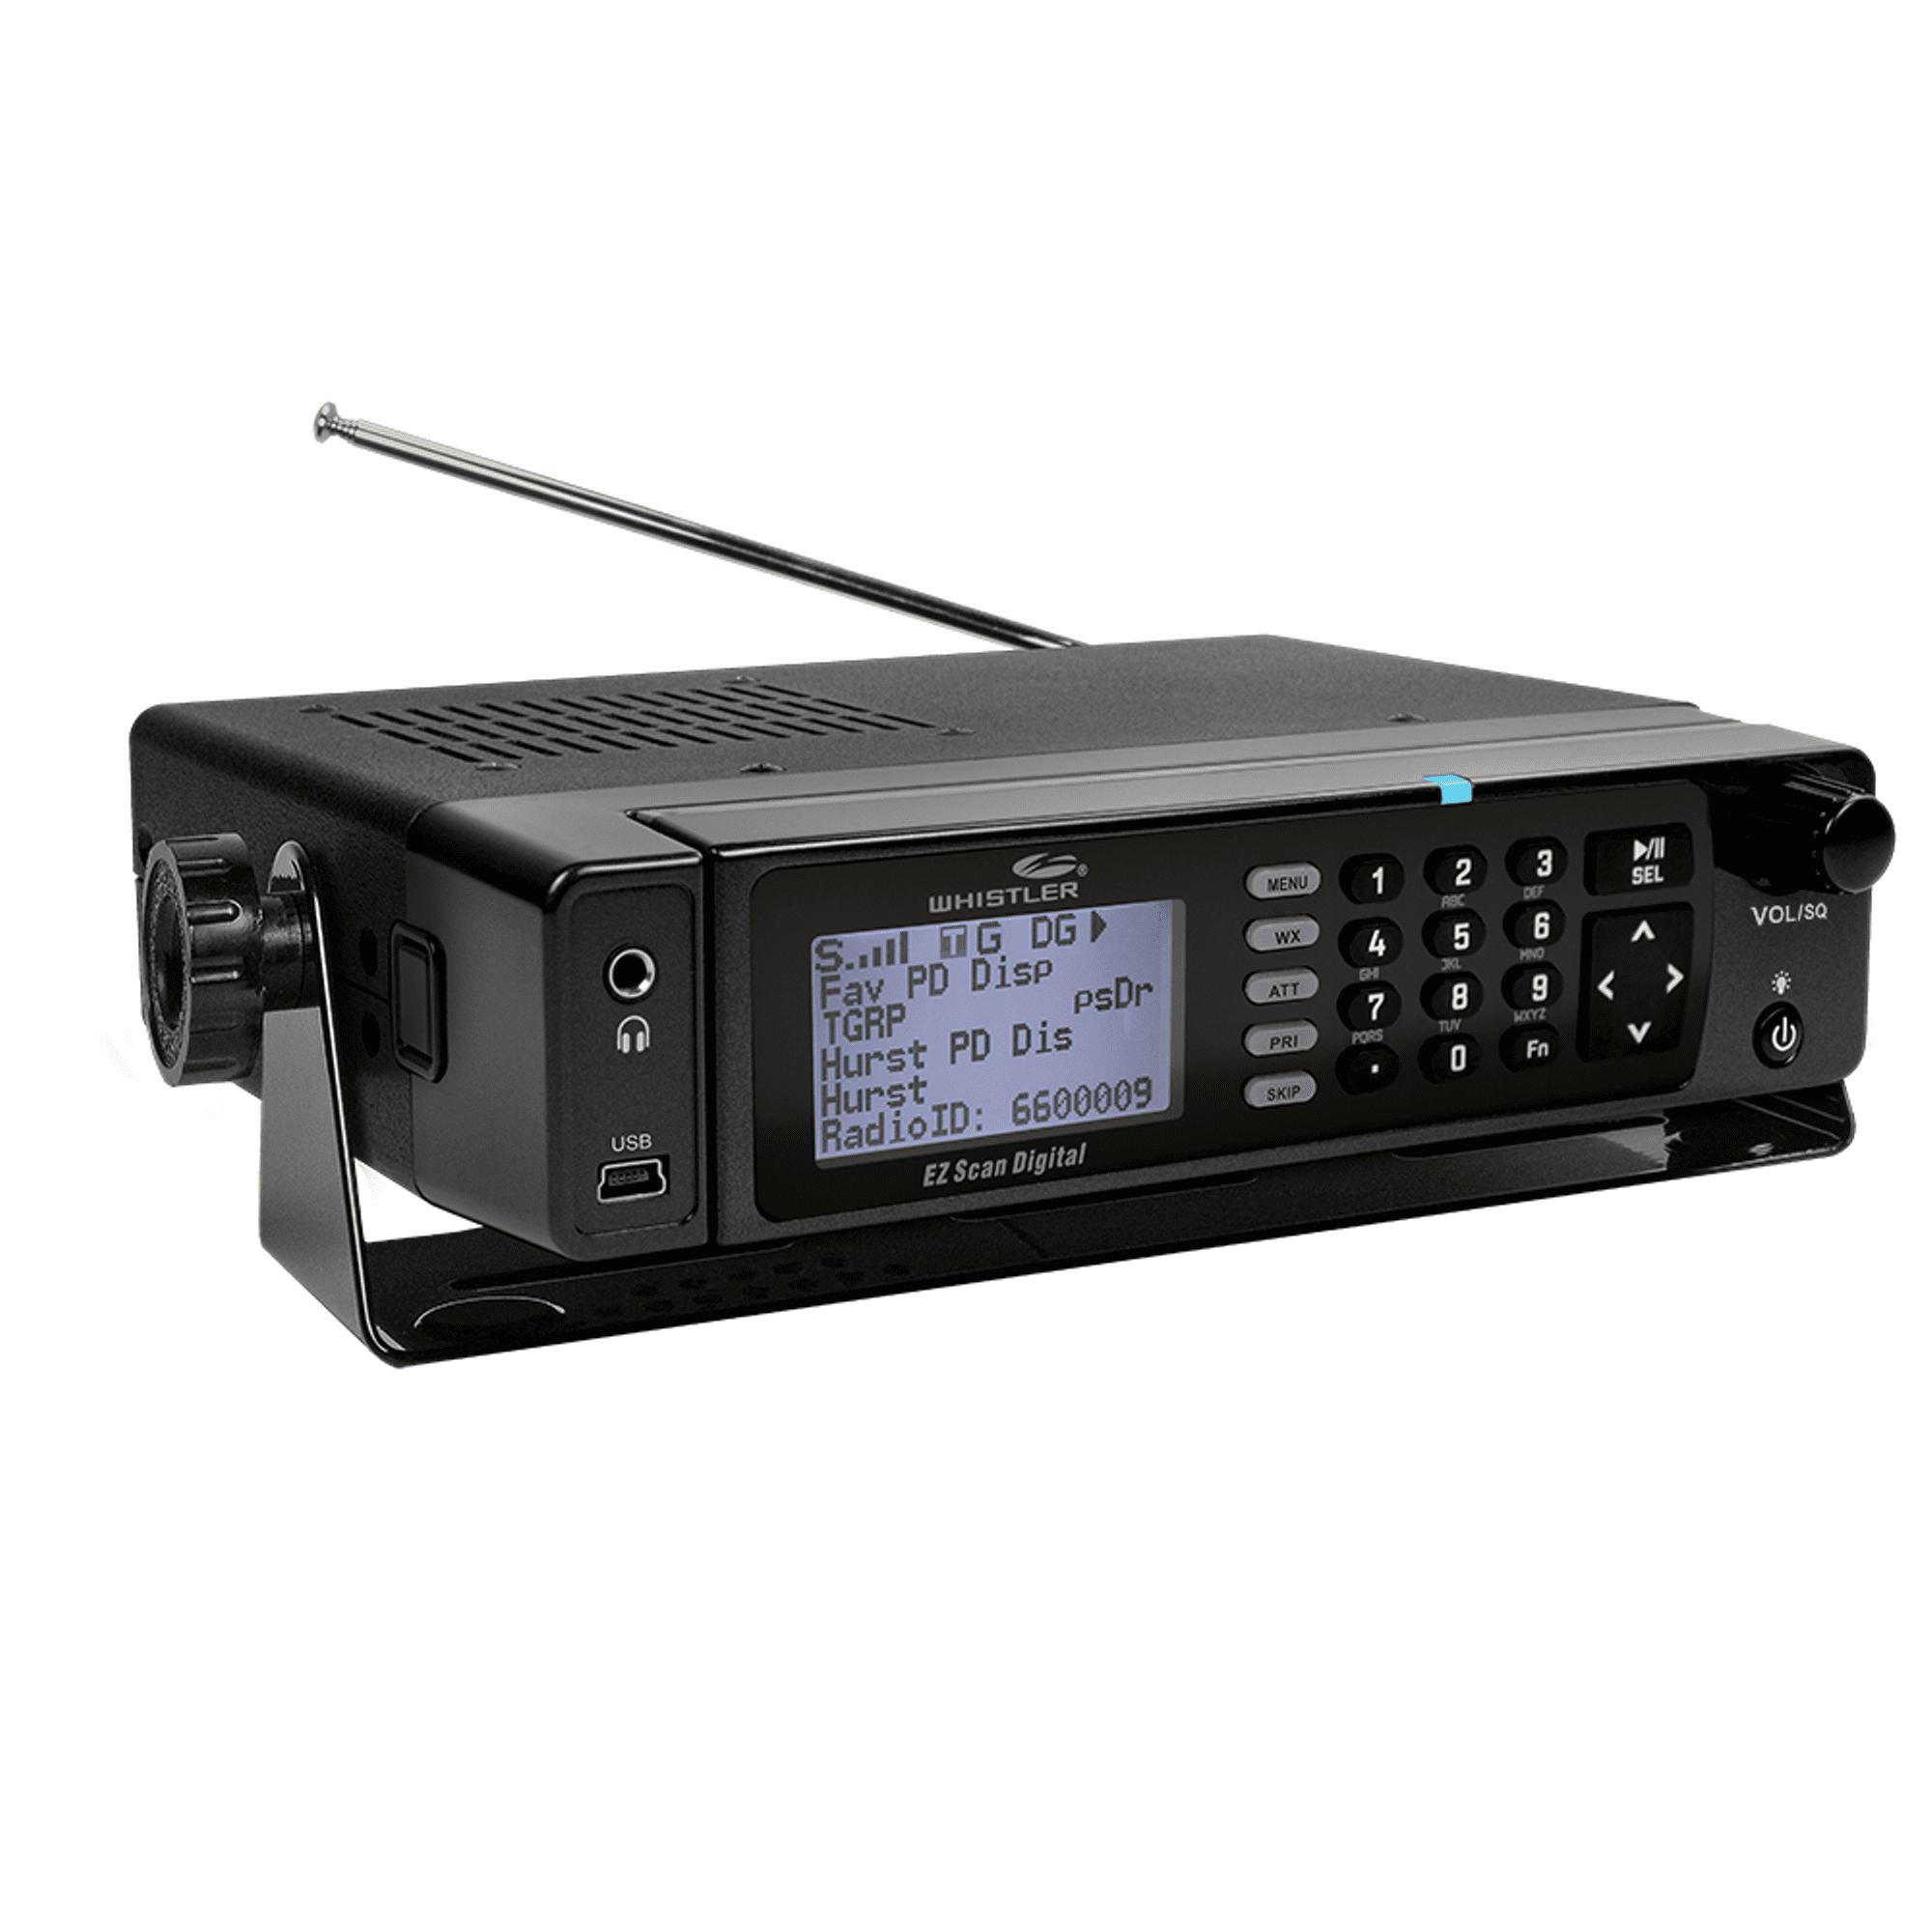 Whistler Group WS1098 Digital Desktop/Mobile Radio Scanner